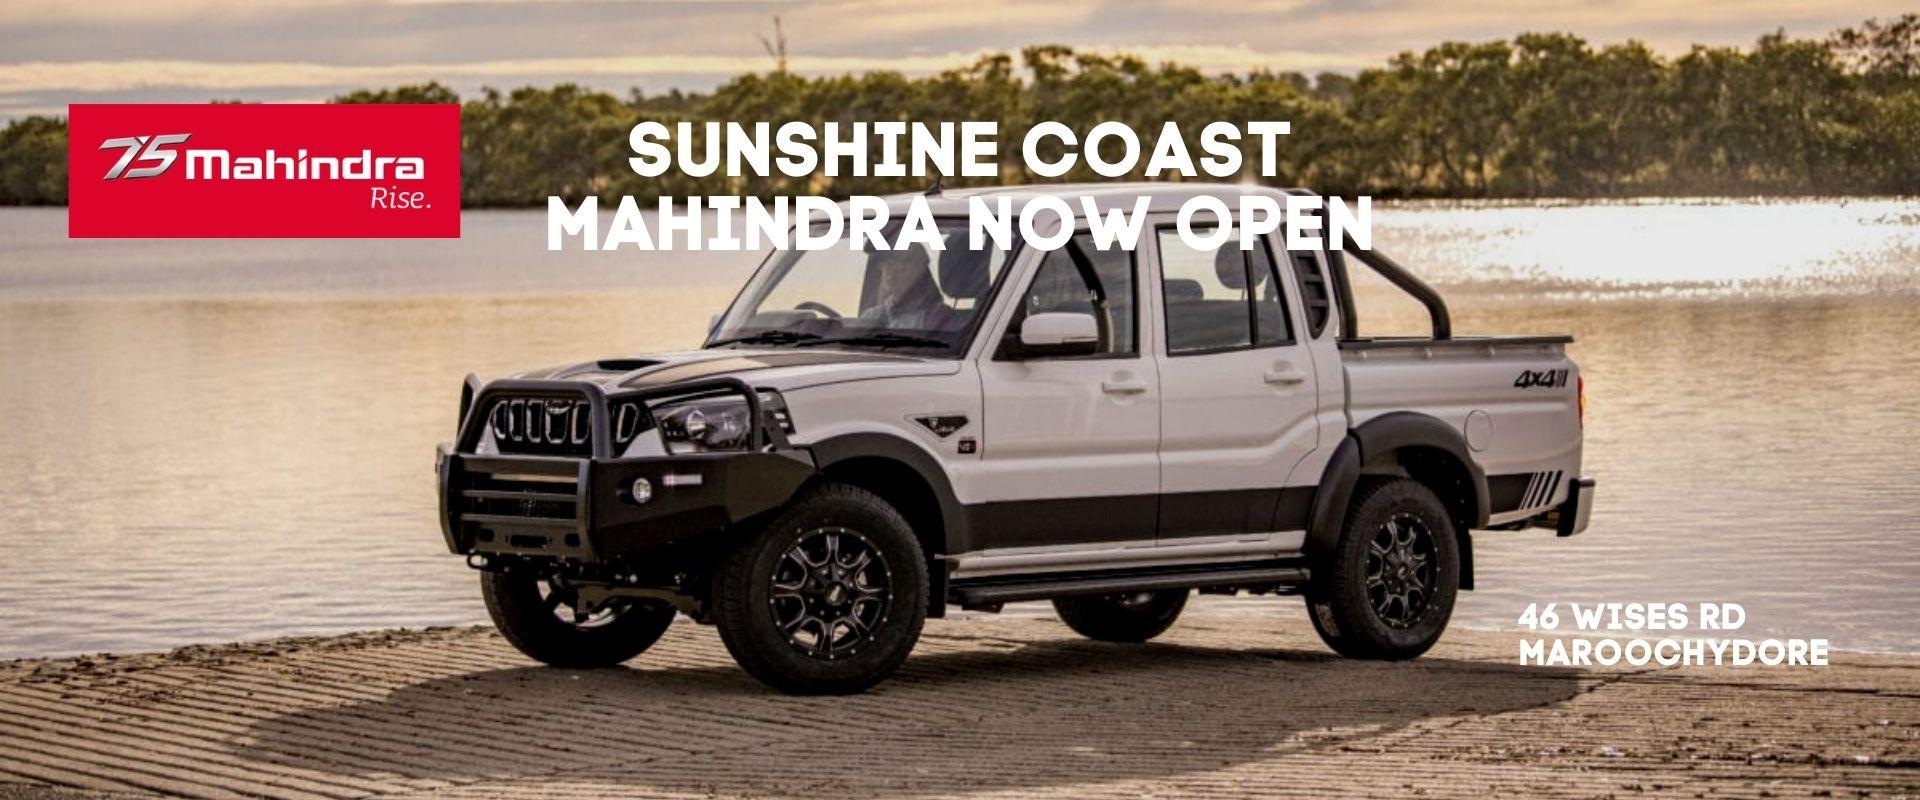 Sunshine Coast Mahindra Now Open